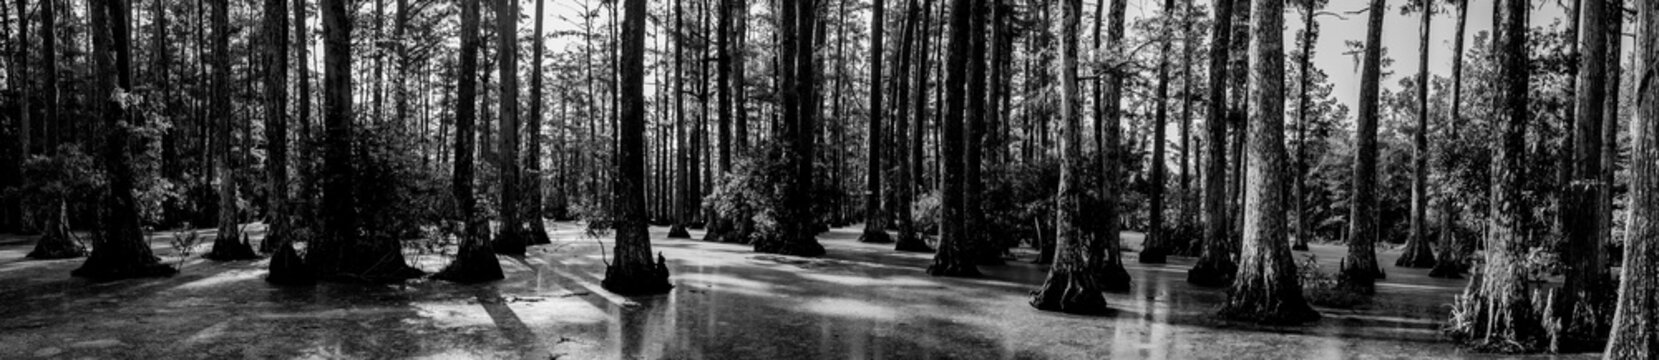 Black and white panoramic photo of bald cypress swamp